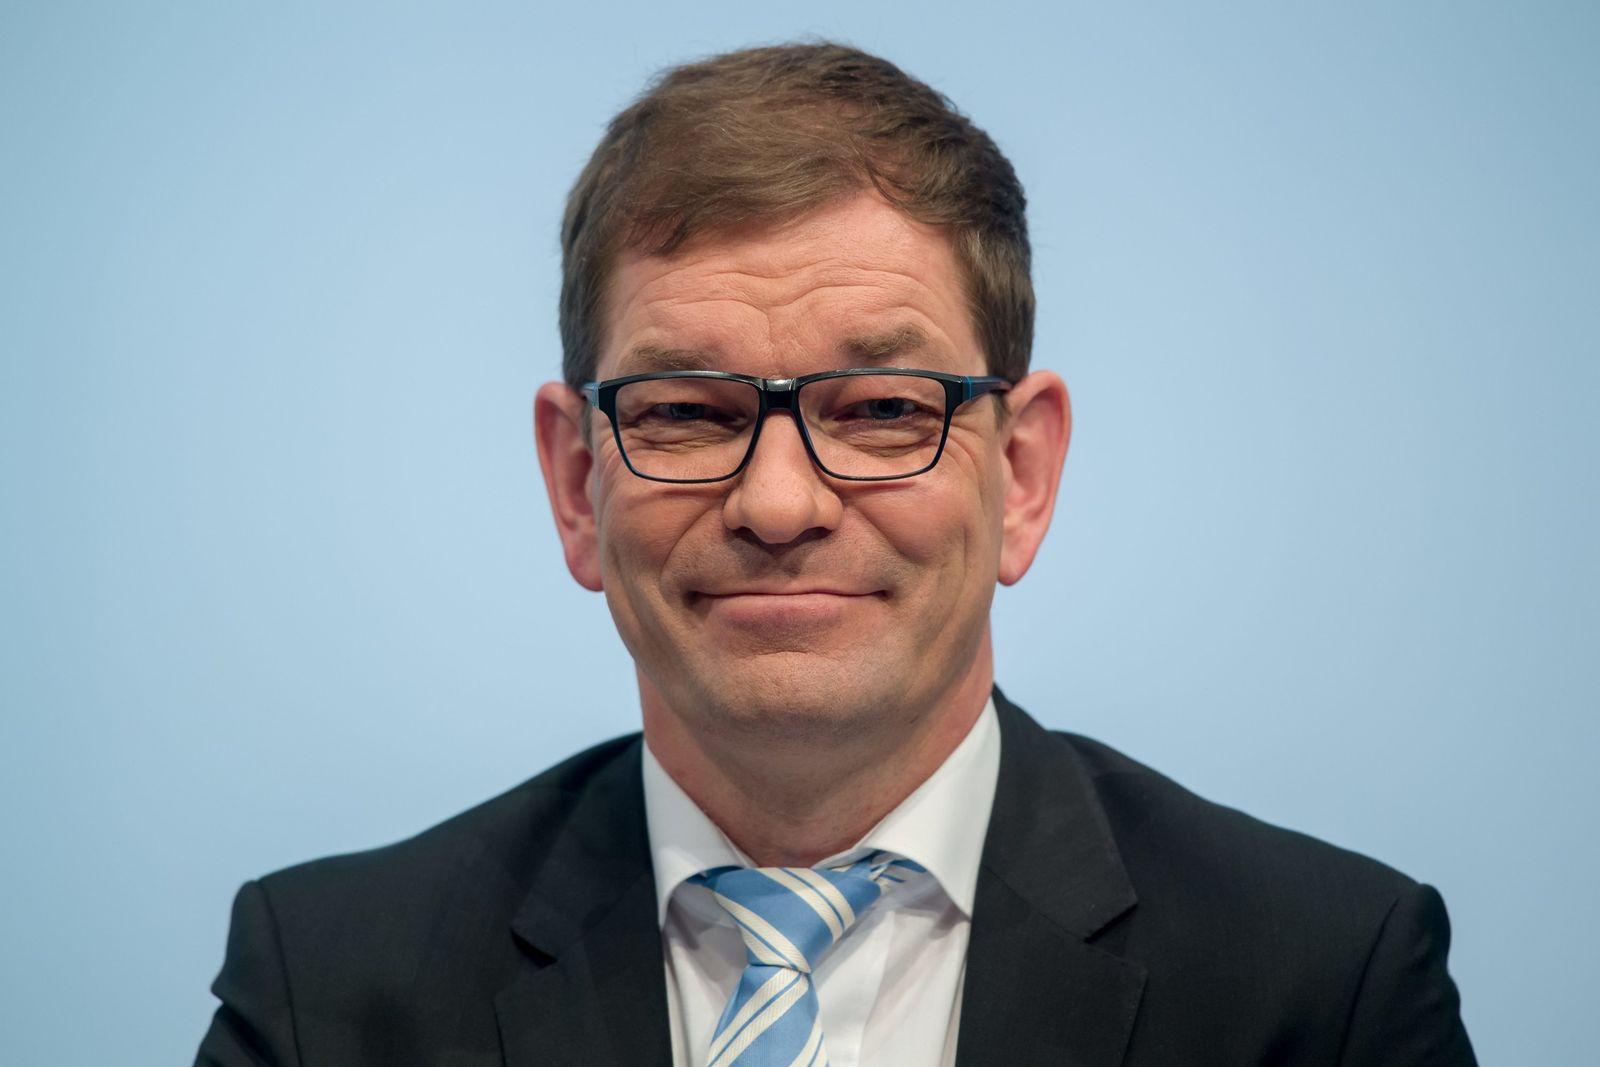 Markus Duesmann, BMW